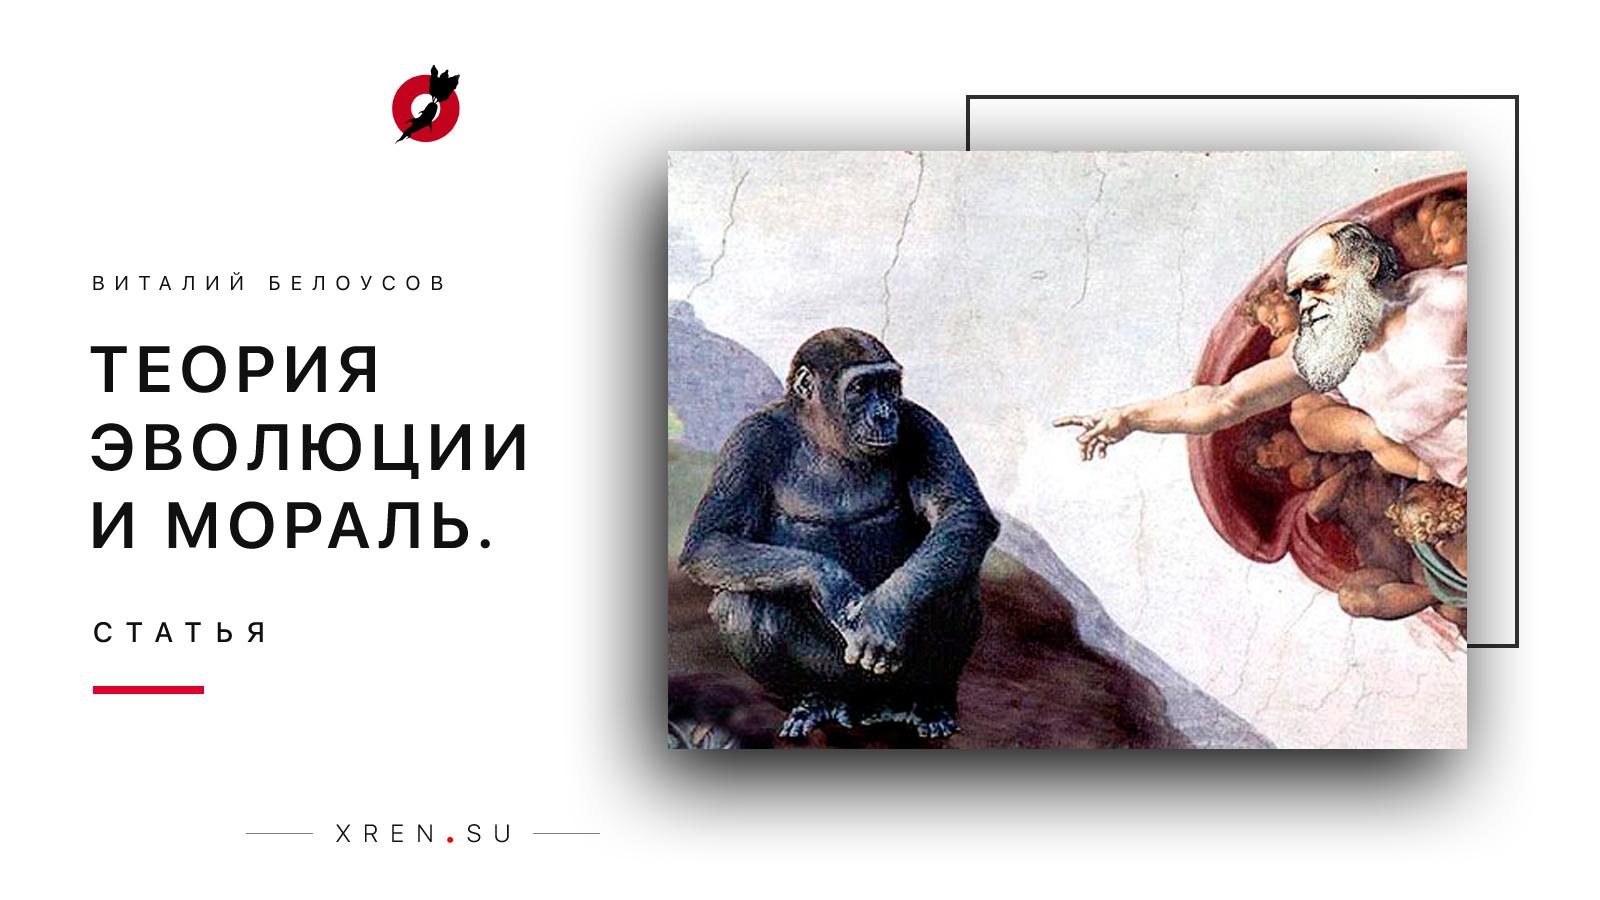 Теория эволюции и мораль